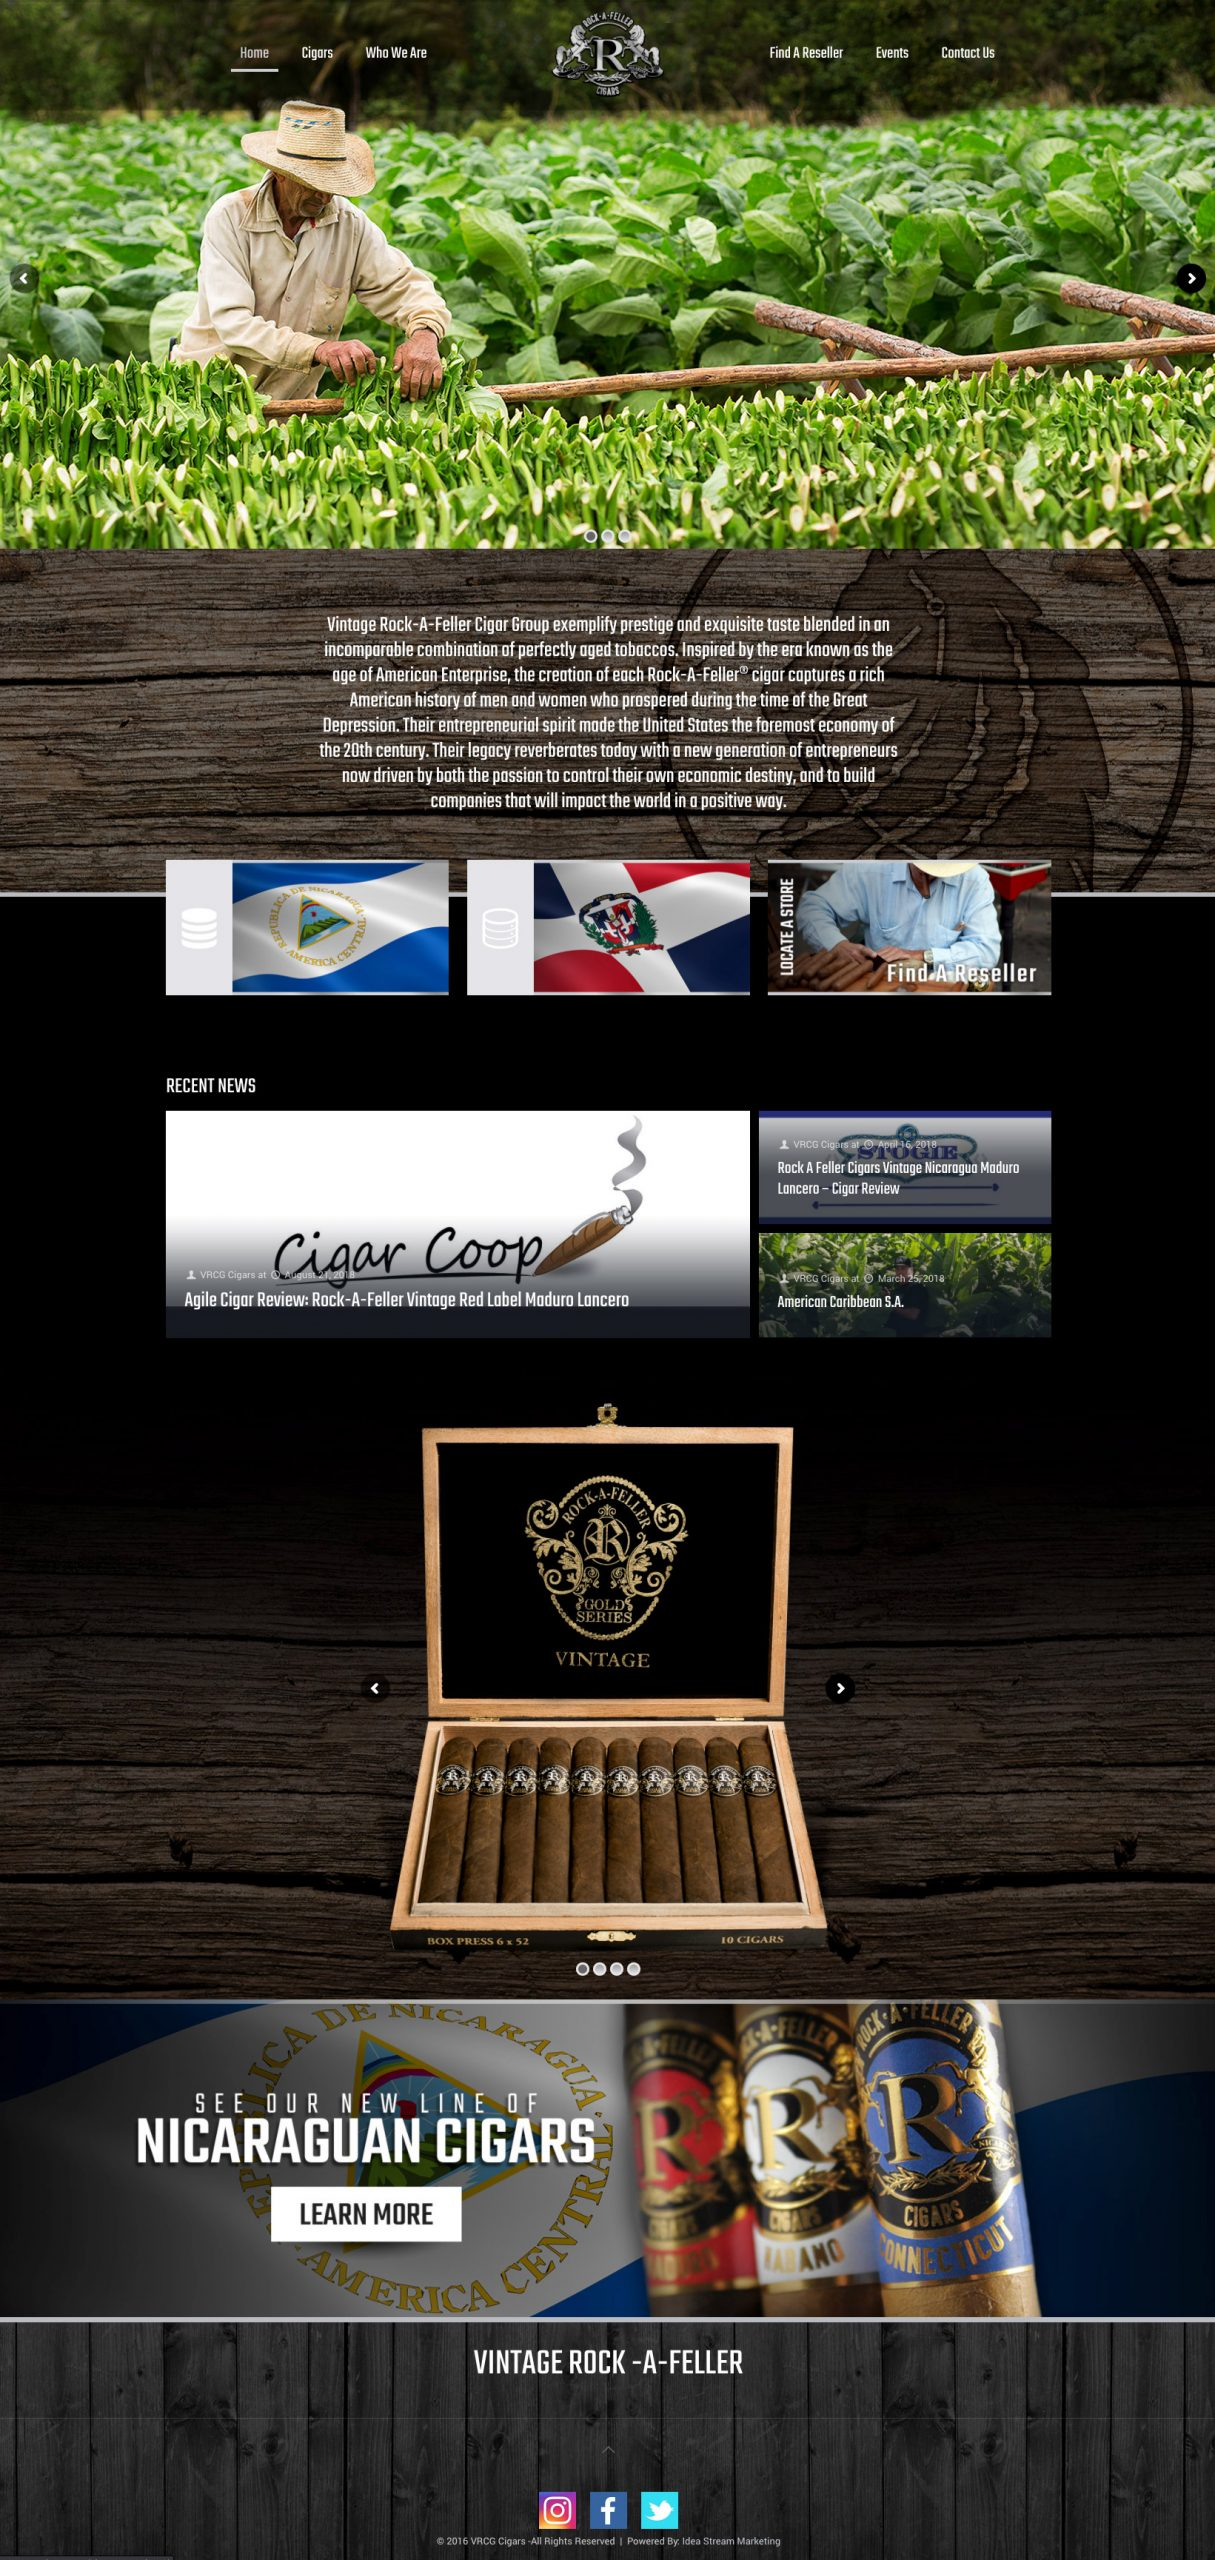 VRCG Cigars